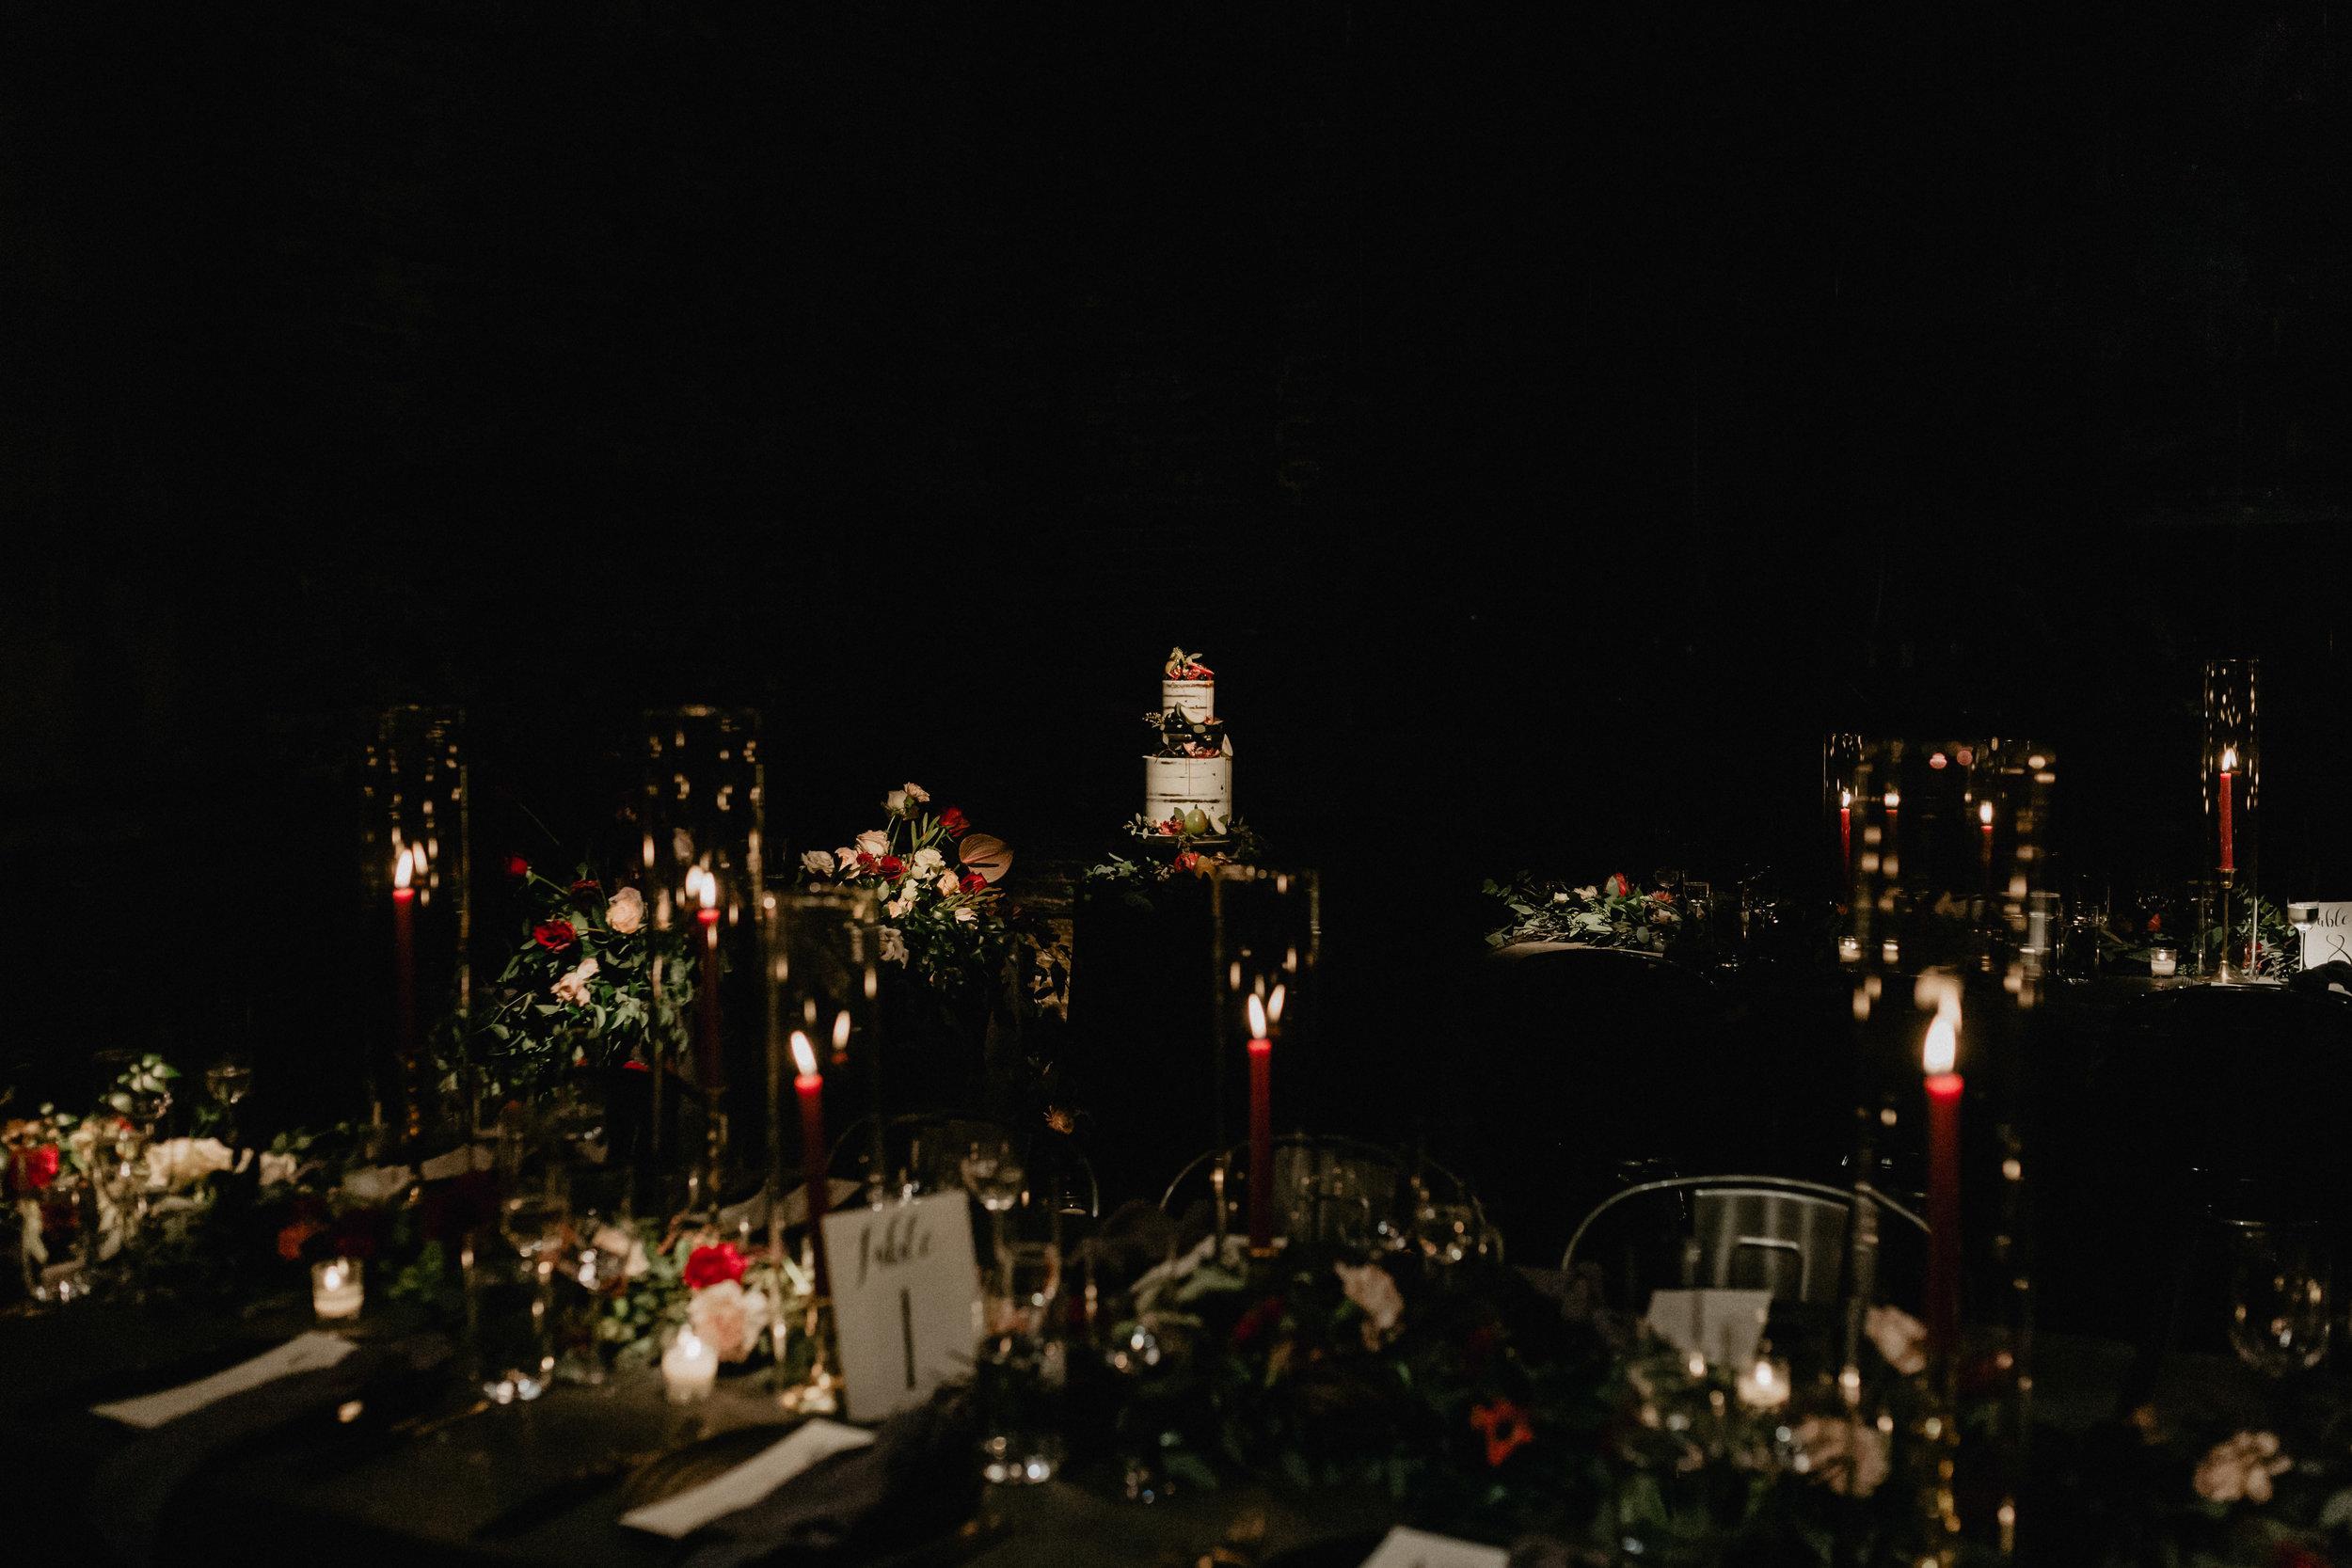 greenpoint_loft_wedding_084.jpg